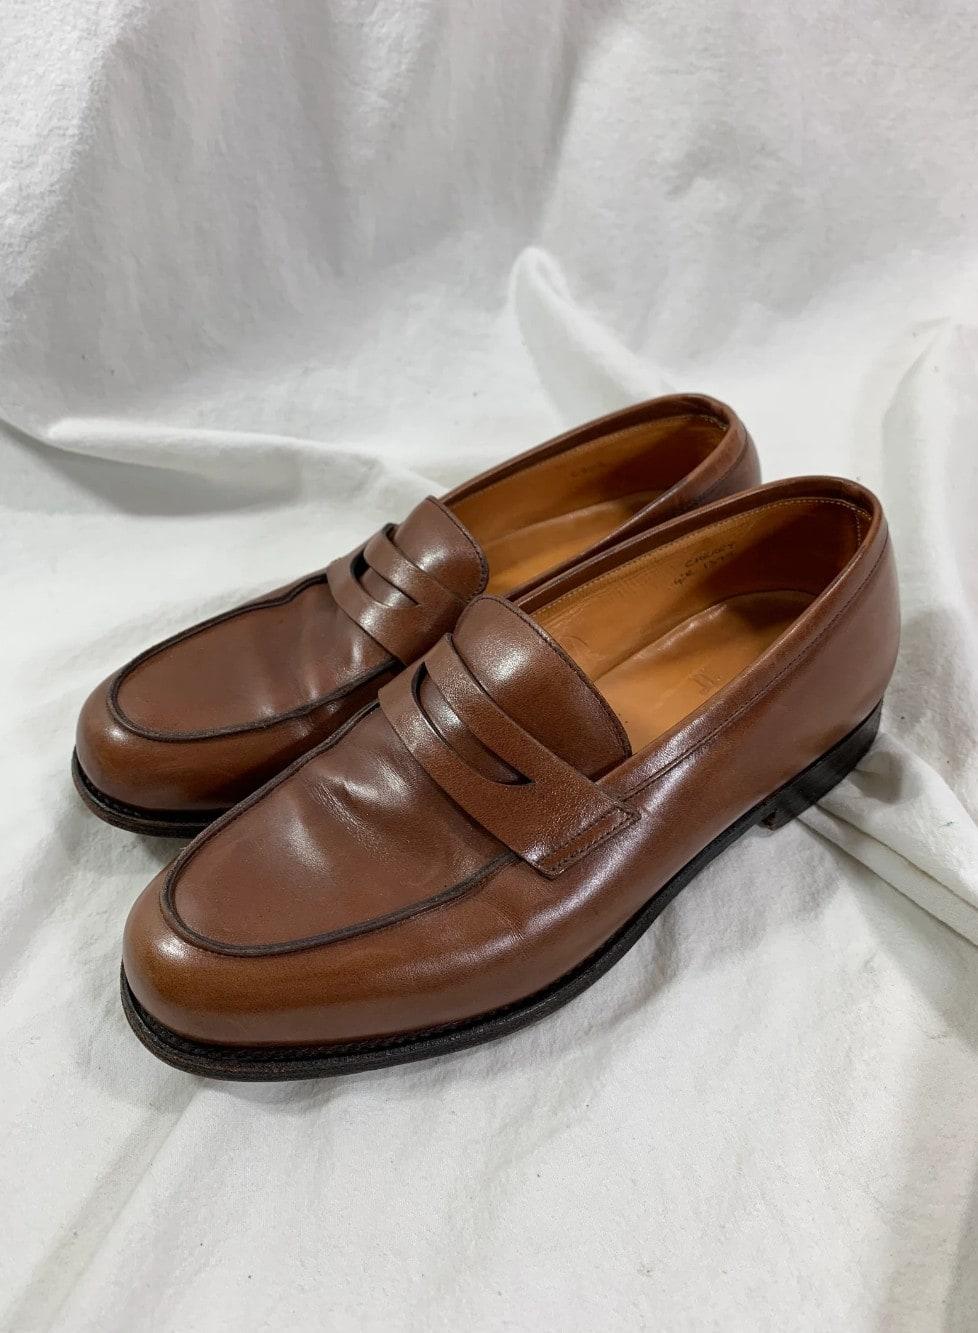 Vintage women JOHN LOBB cherry Rowan leather loafers shoes 4 E 6 US